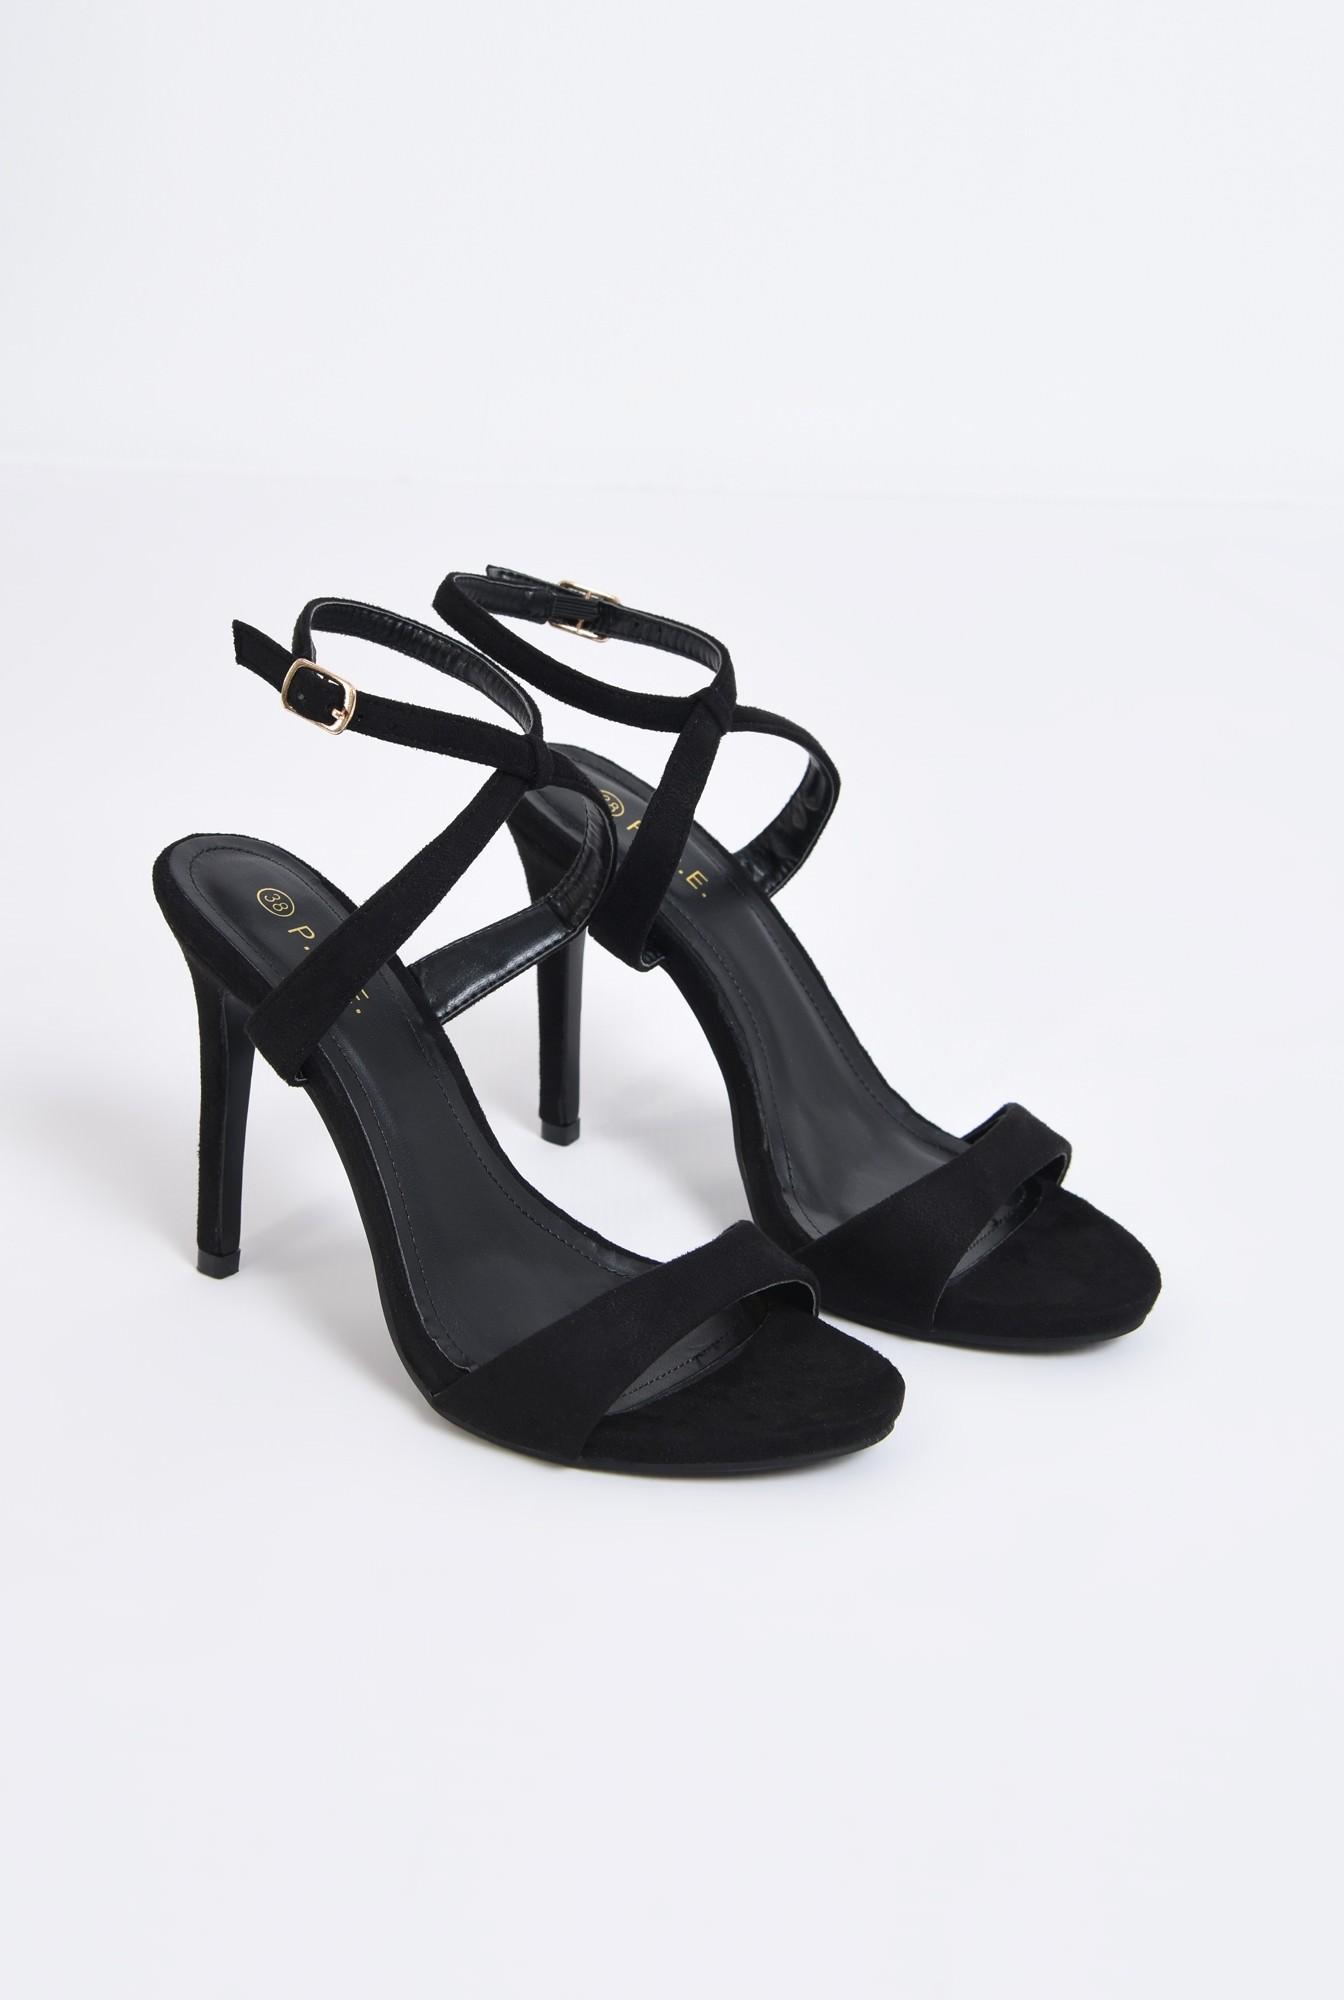 1 - sandale elegante, velur, negru, toc cui